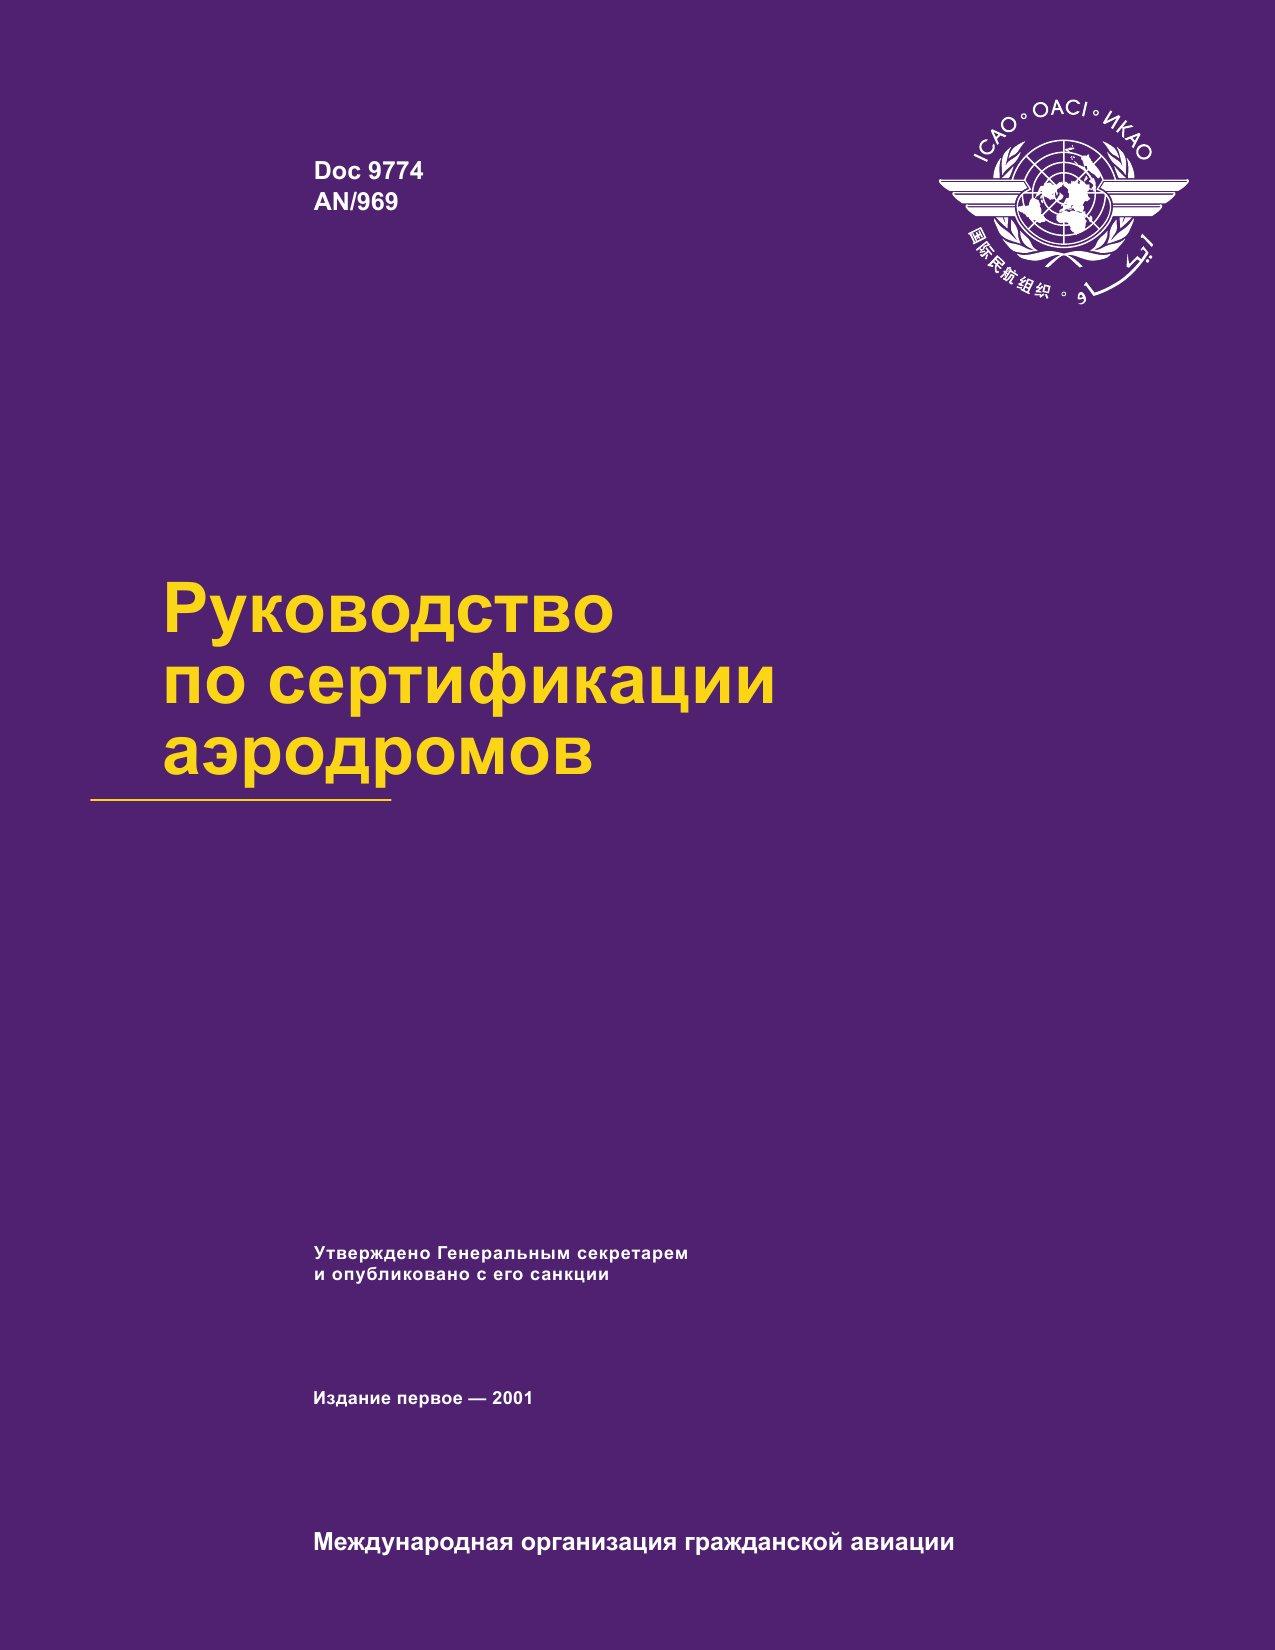 ICAO Doc 9774 Руководство по сертификации аэродромов